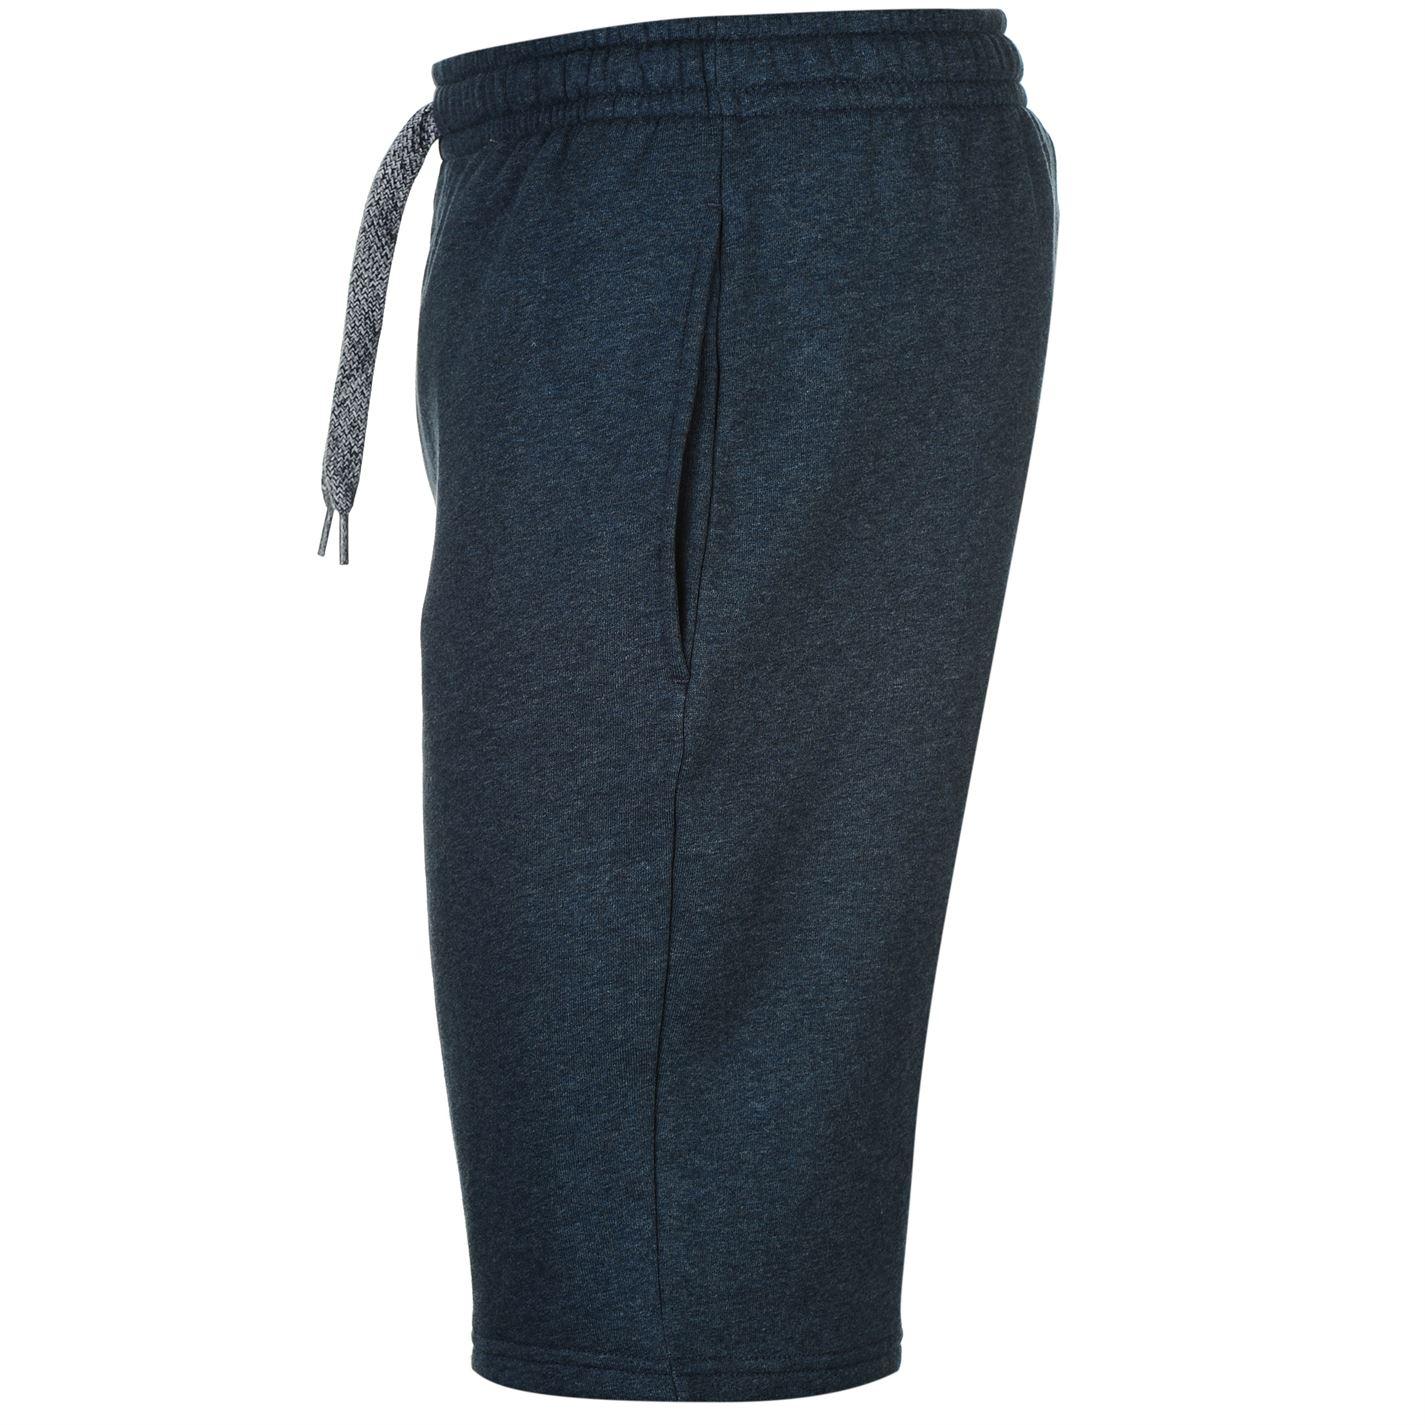 Lacoste-Fleece-Jogger-Shorts-Mens thumbnail 9